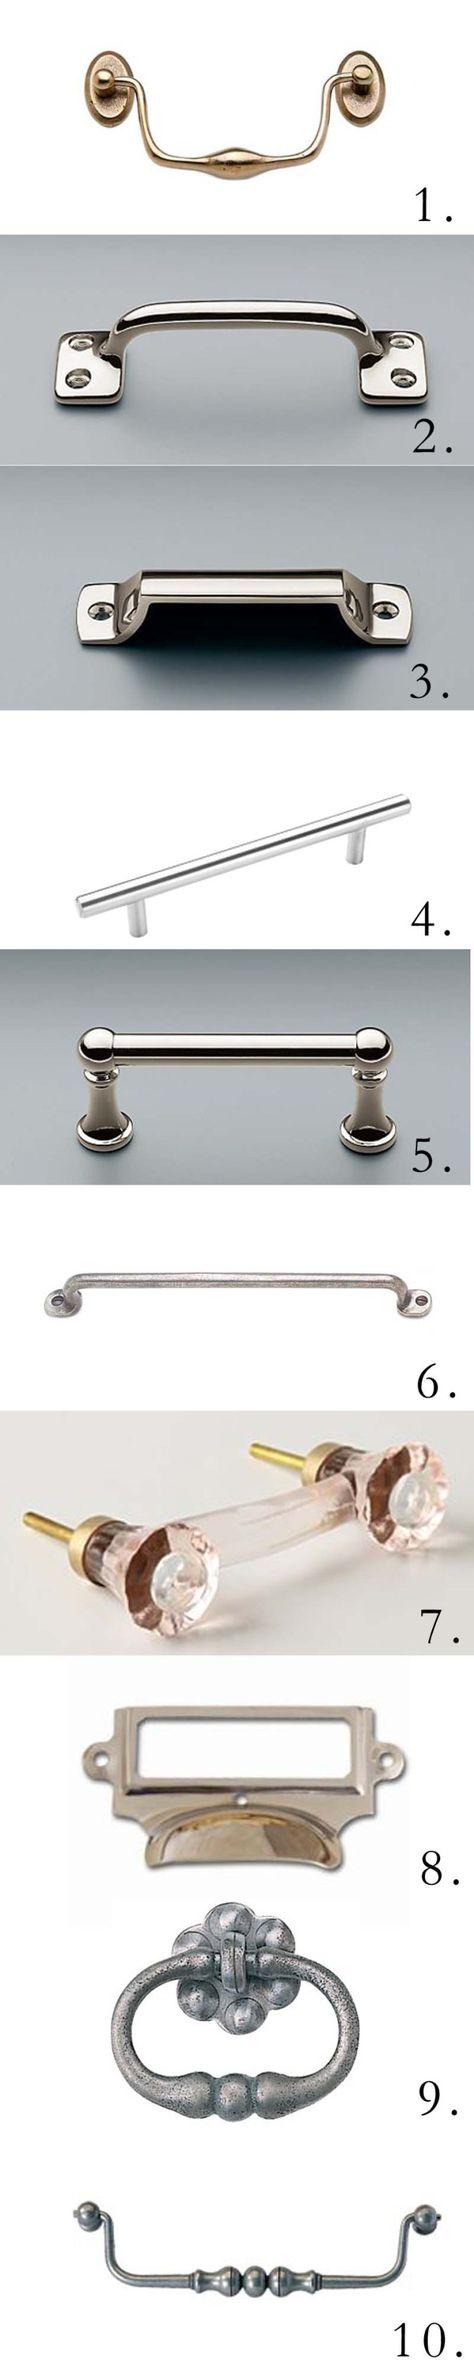 tracery tips] cabinet hardware | Cabinet hardware, Restoration ...